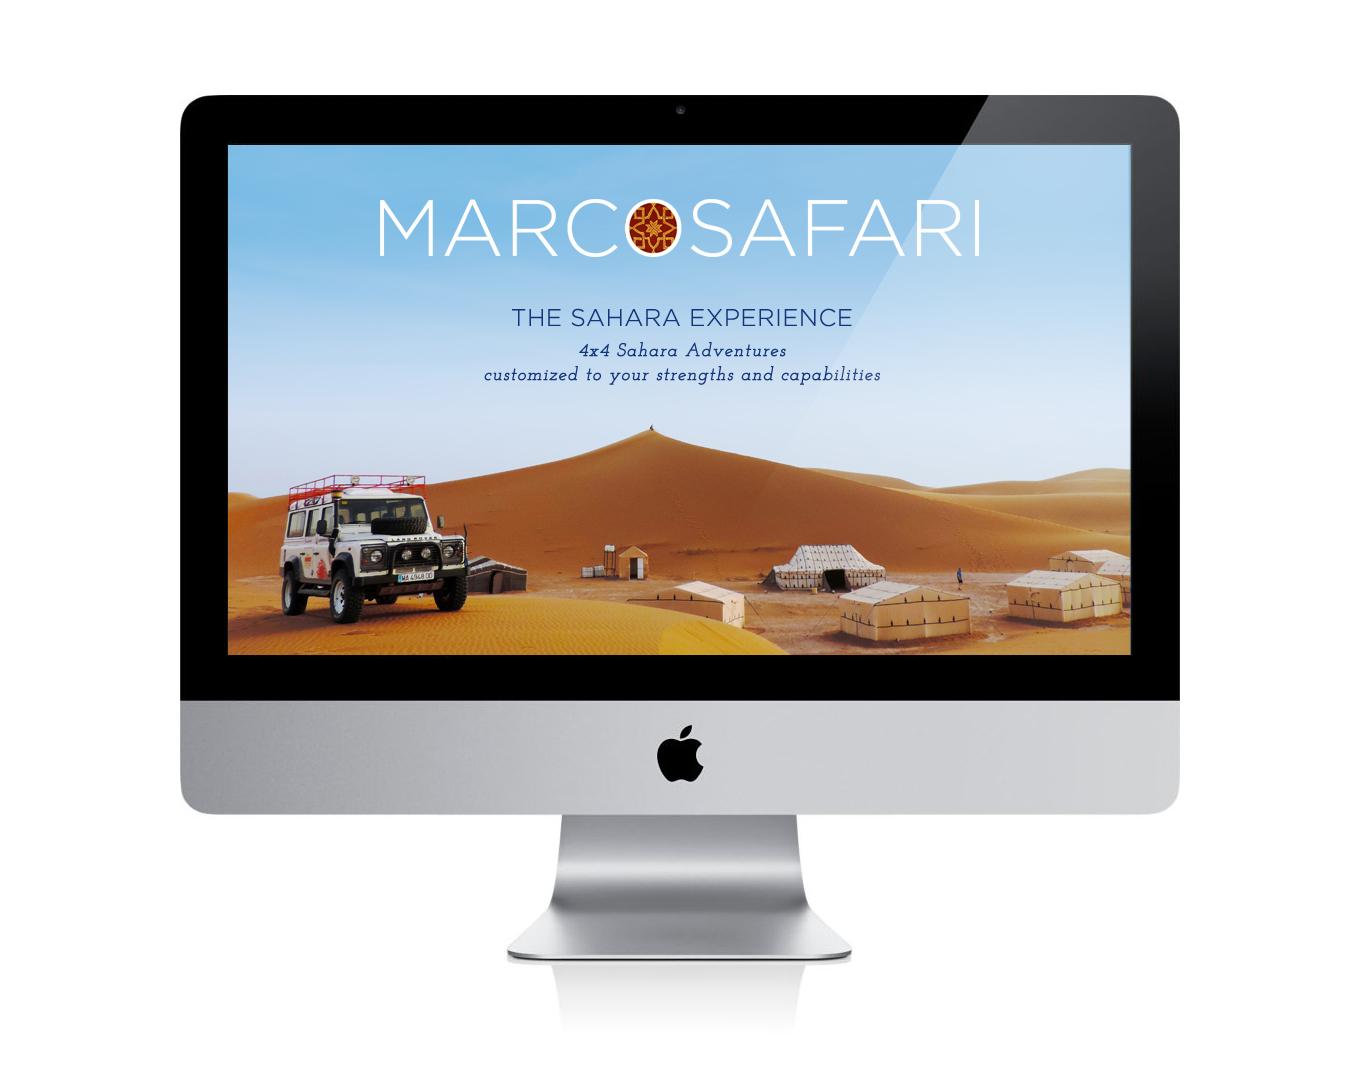 Marco Safari web imac